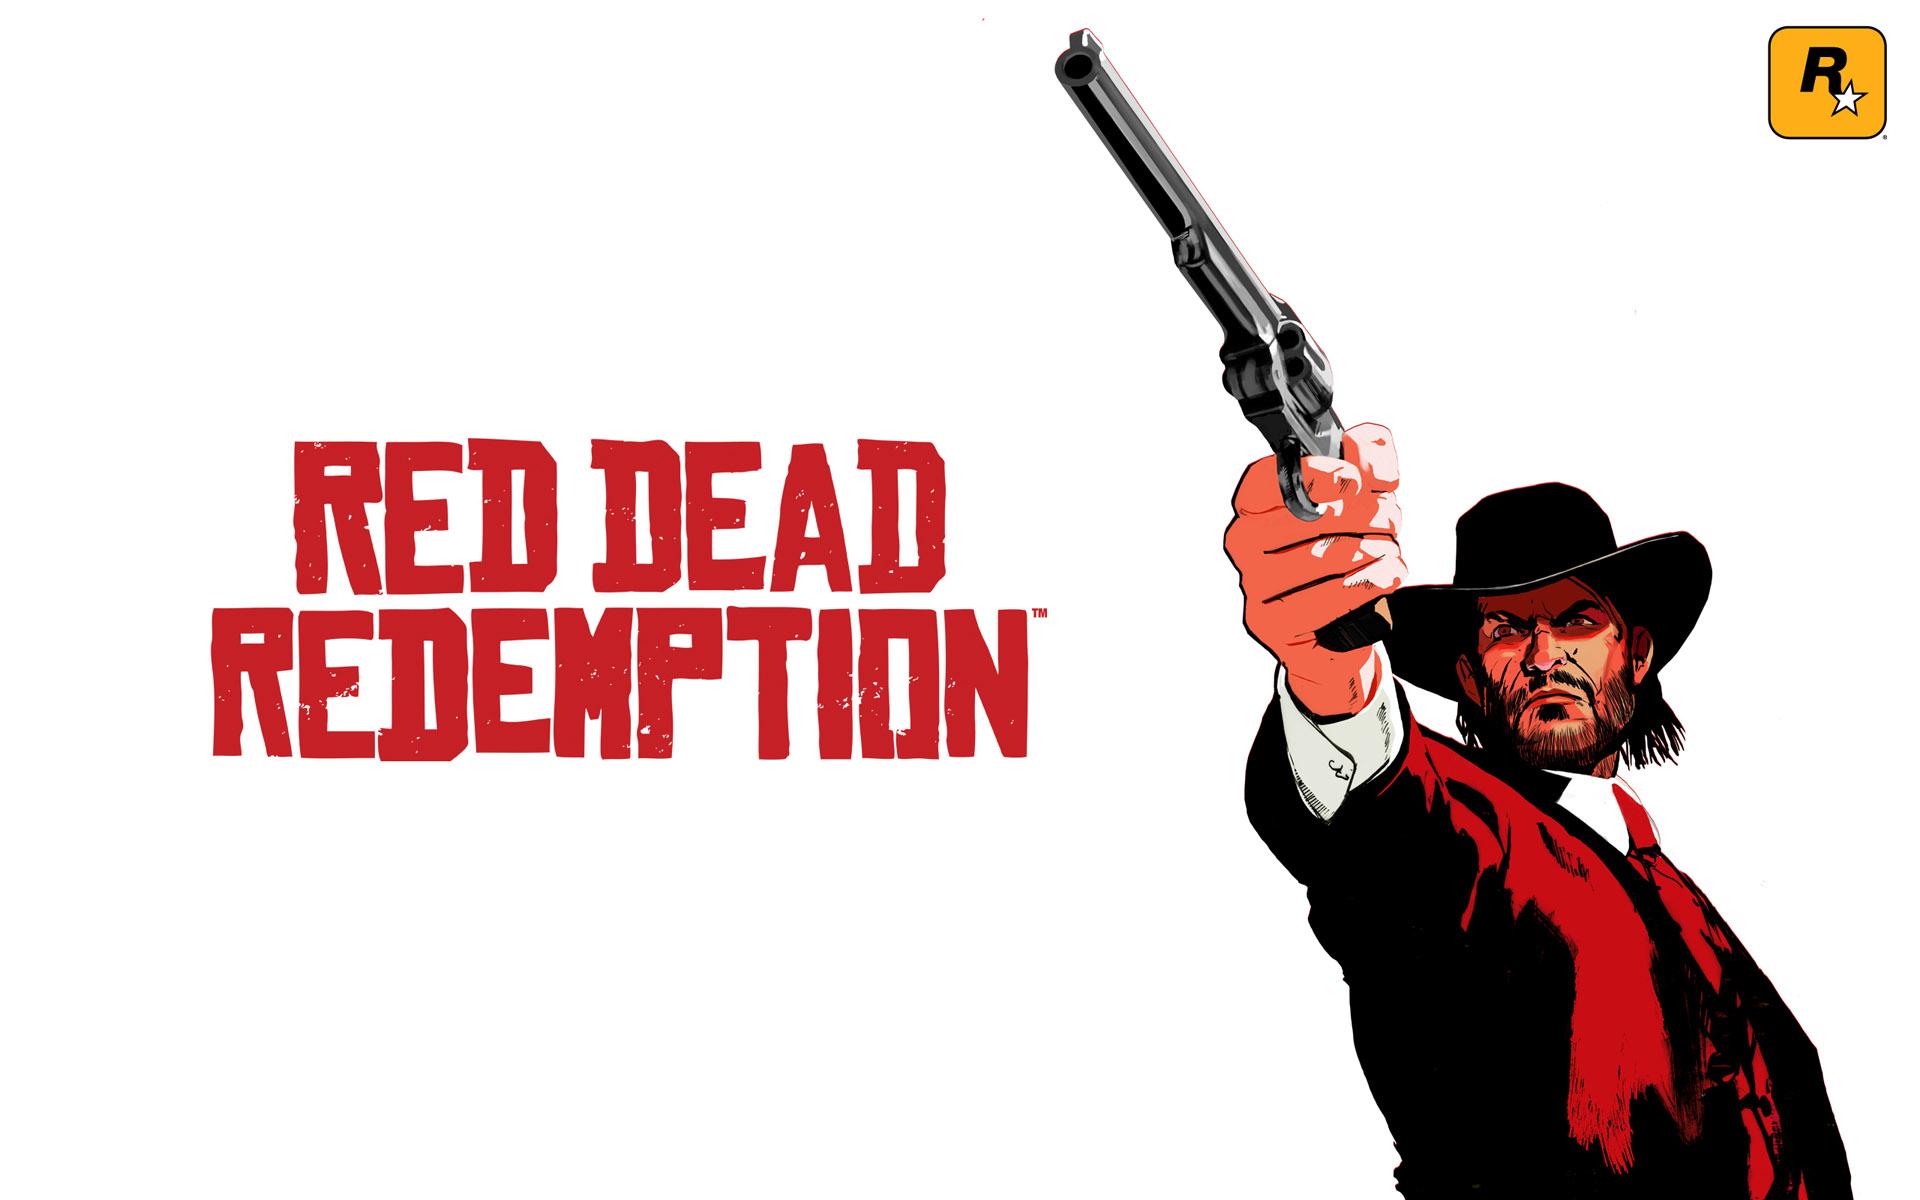 Red Dead Redemption Background Hd Wallpaper